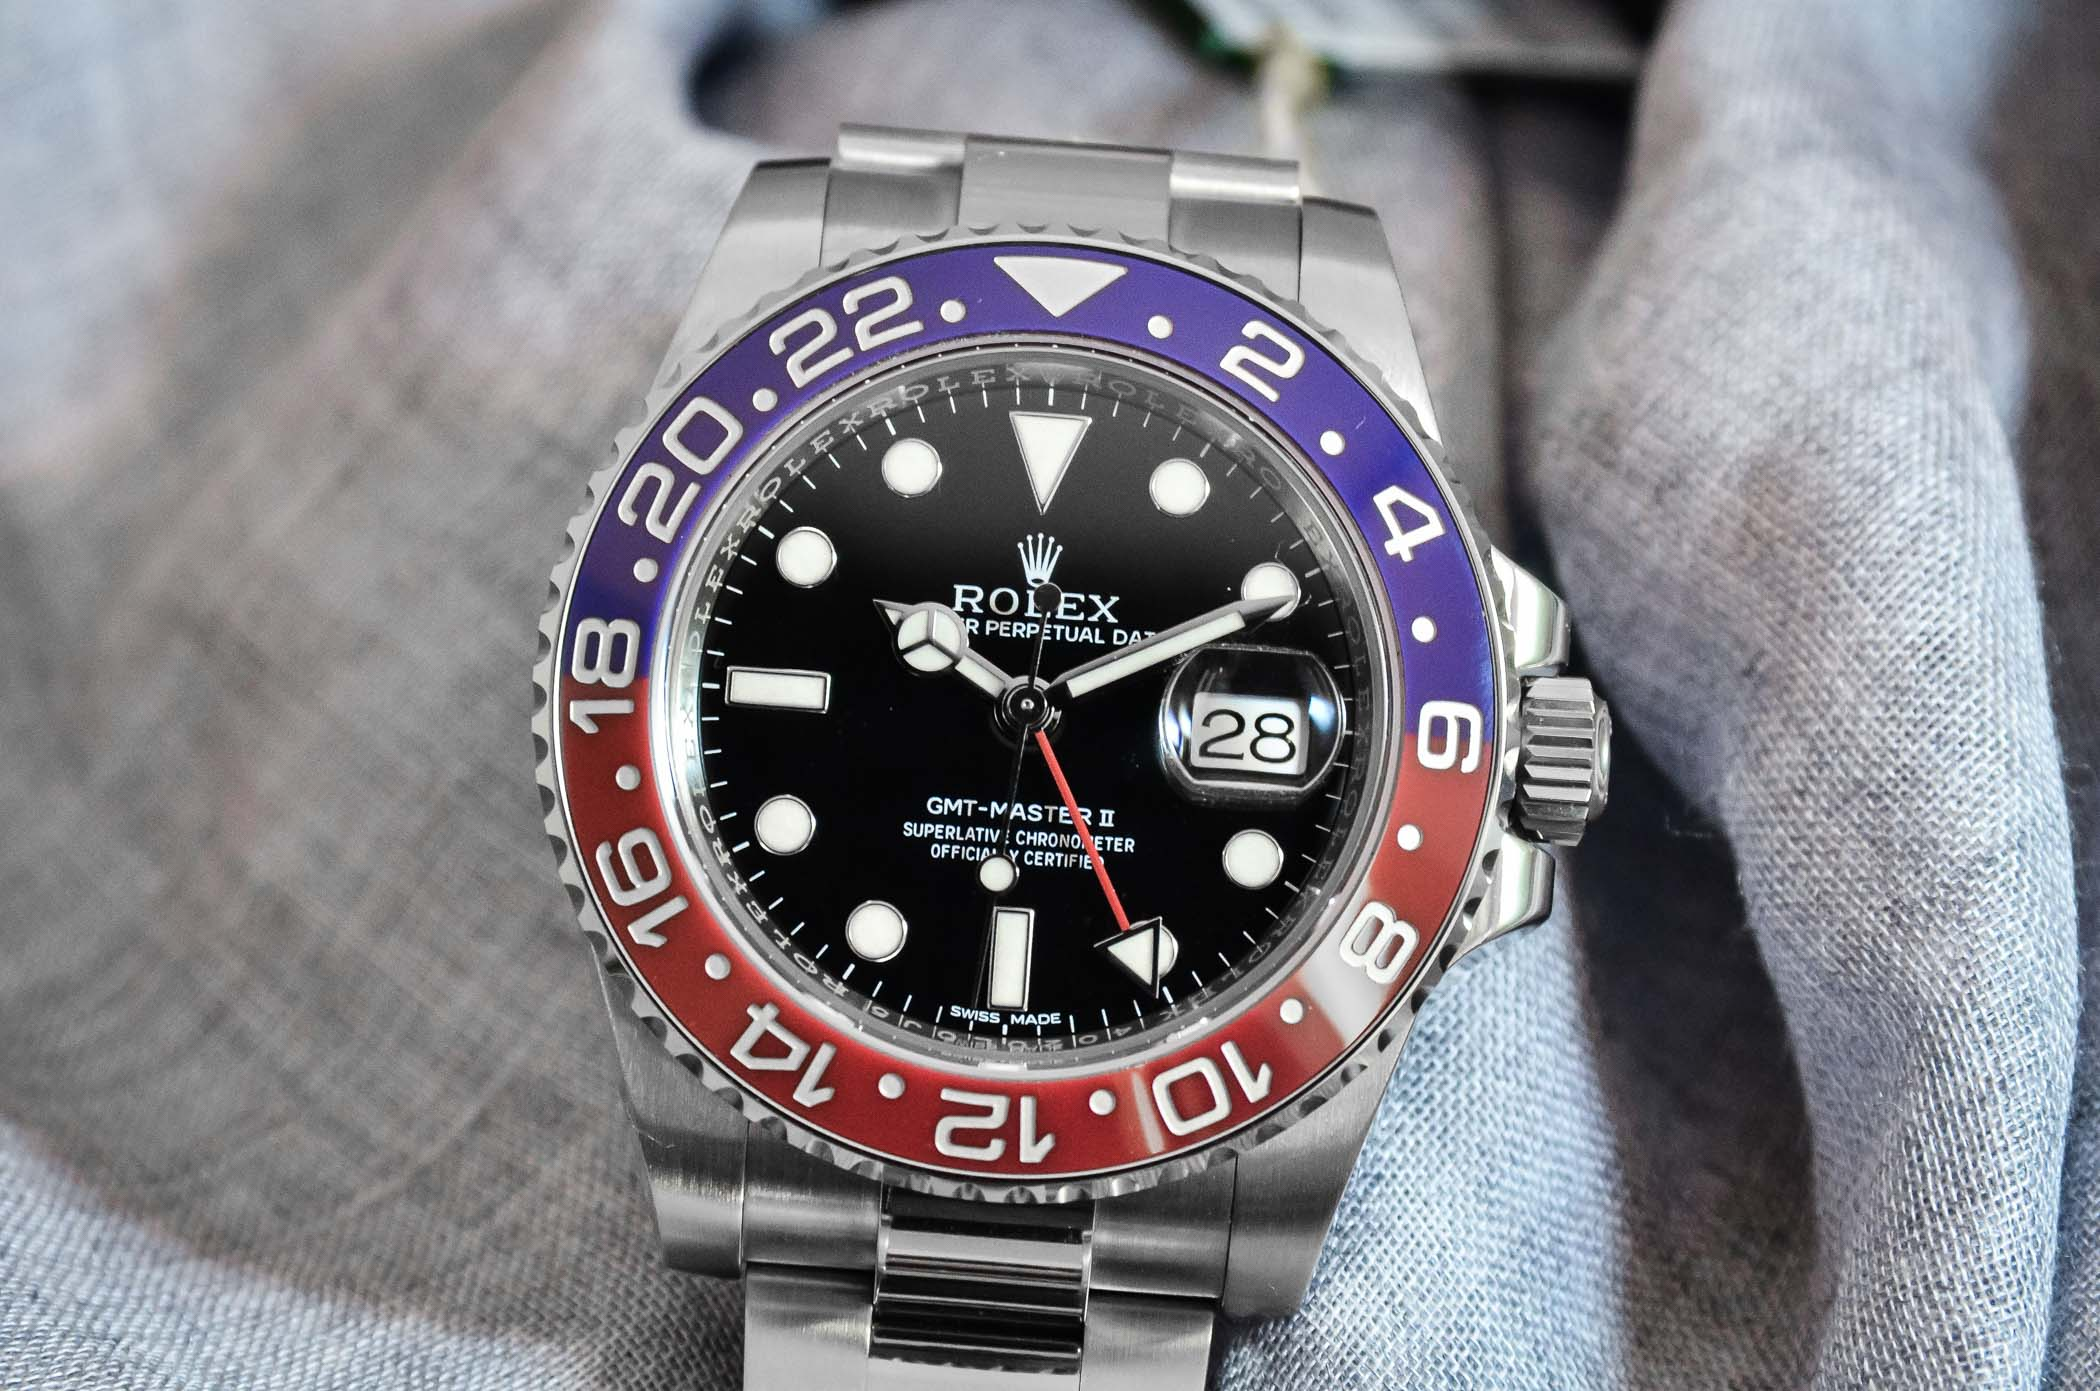 Introducing the Rolex GMT-Master II Pepsi ref. 116719BLRO ...